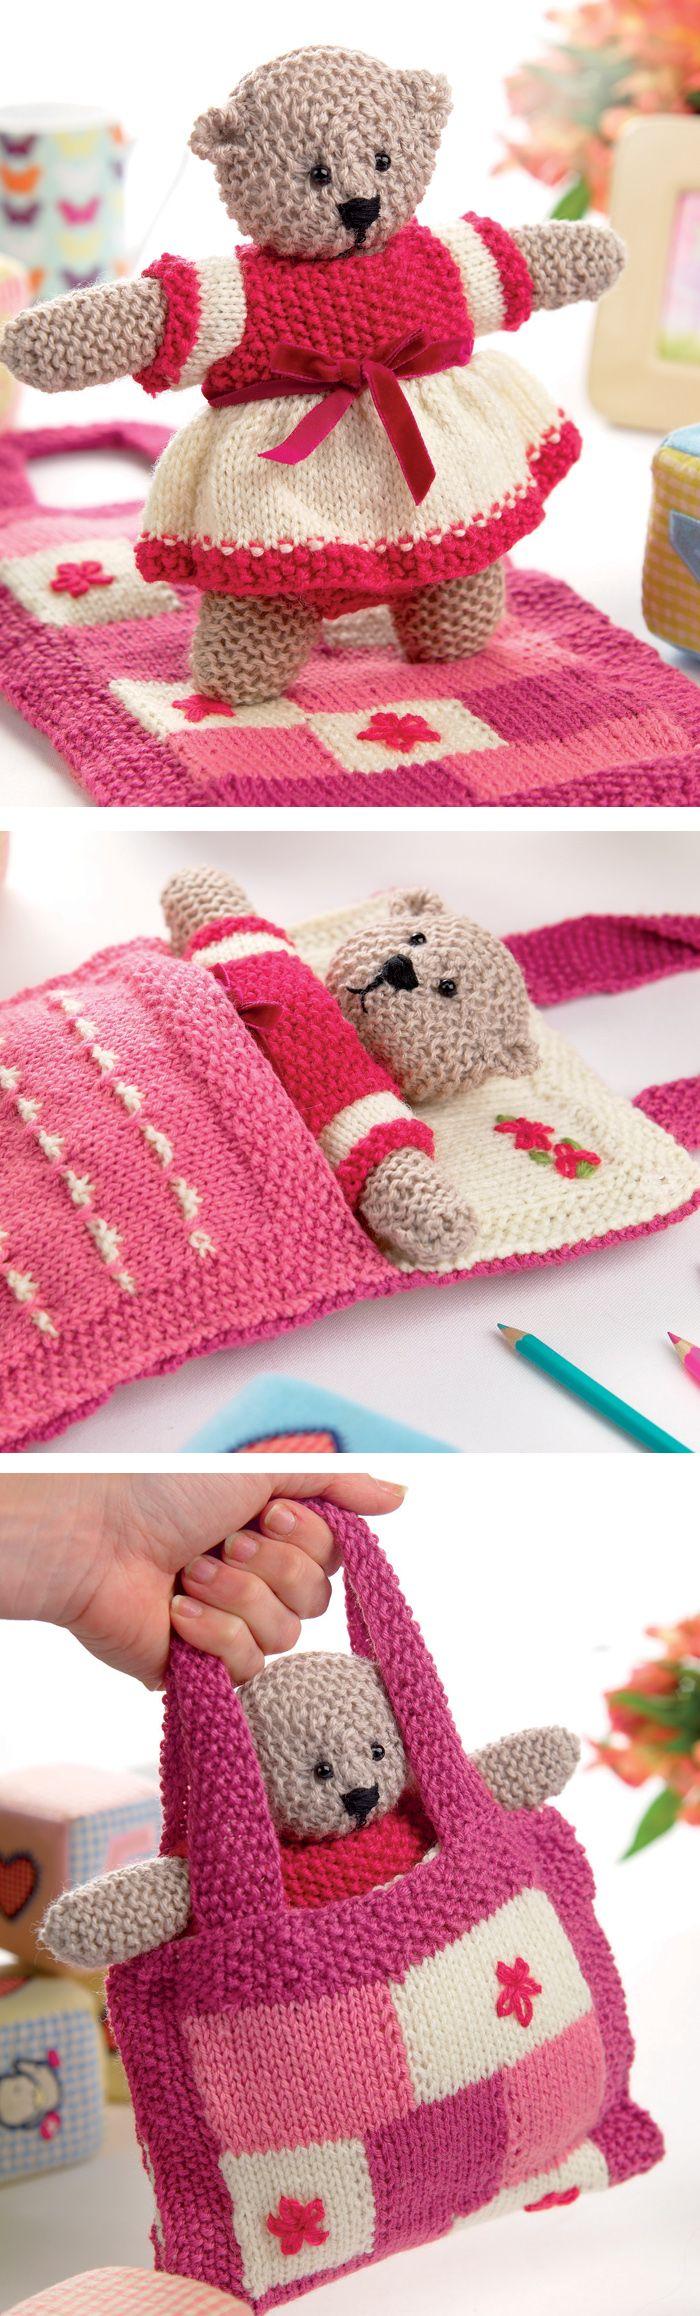 Free Until Nov 26, 2017 - Knitting Pattern for Shirley Bear